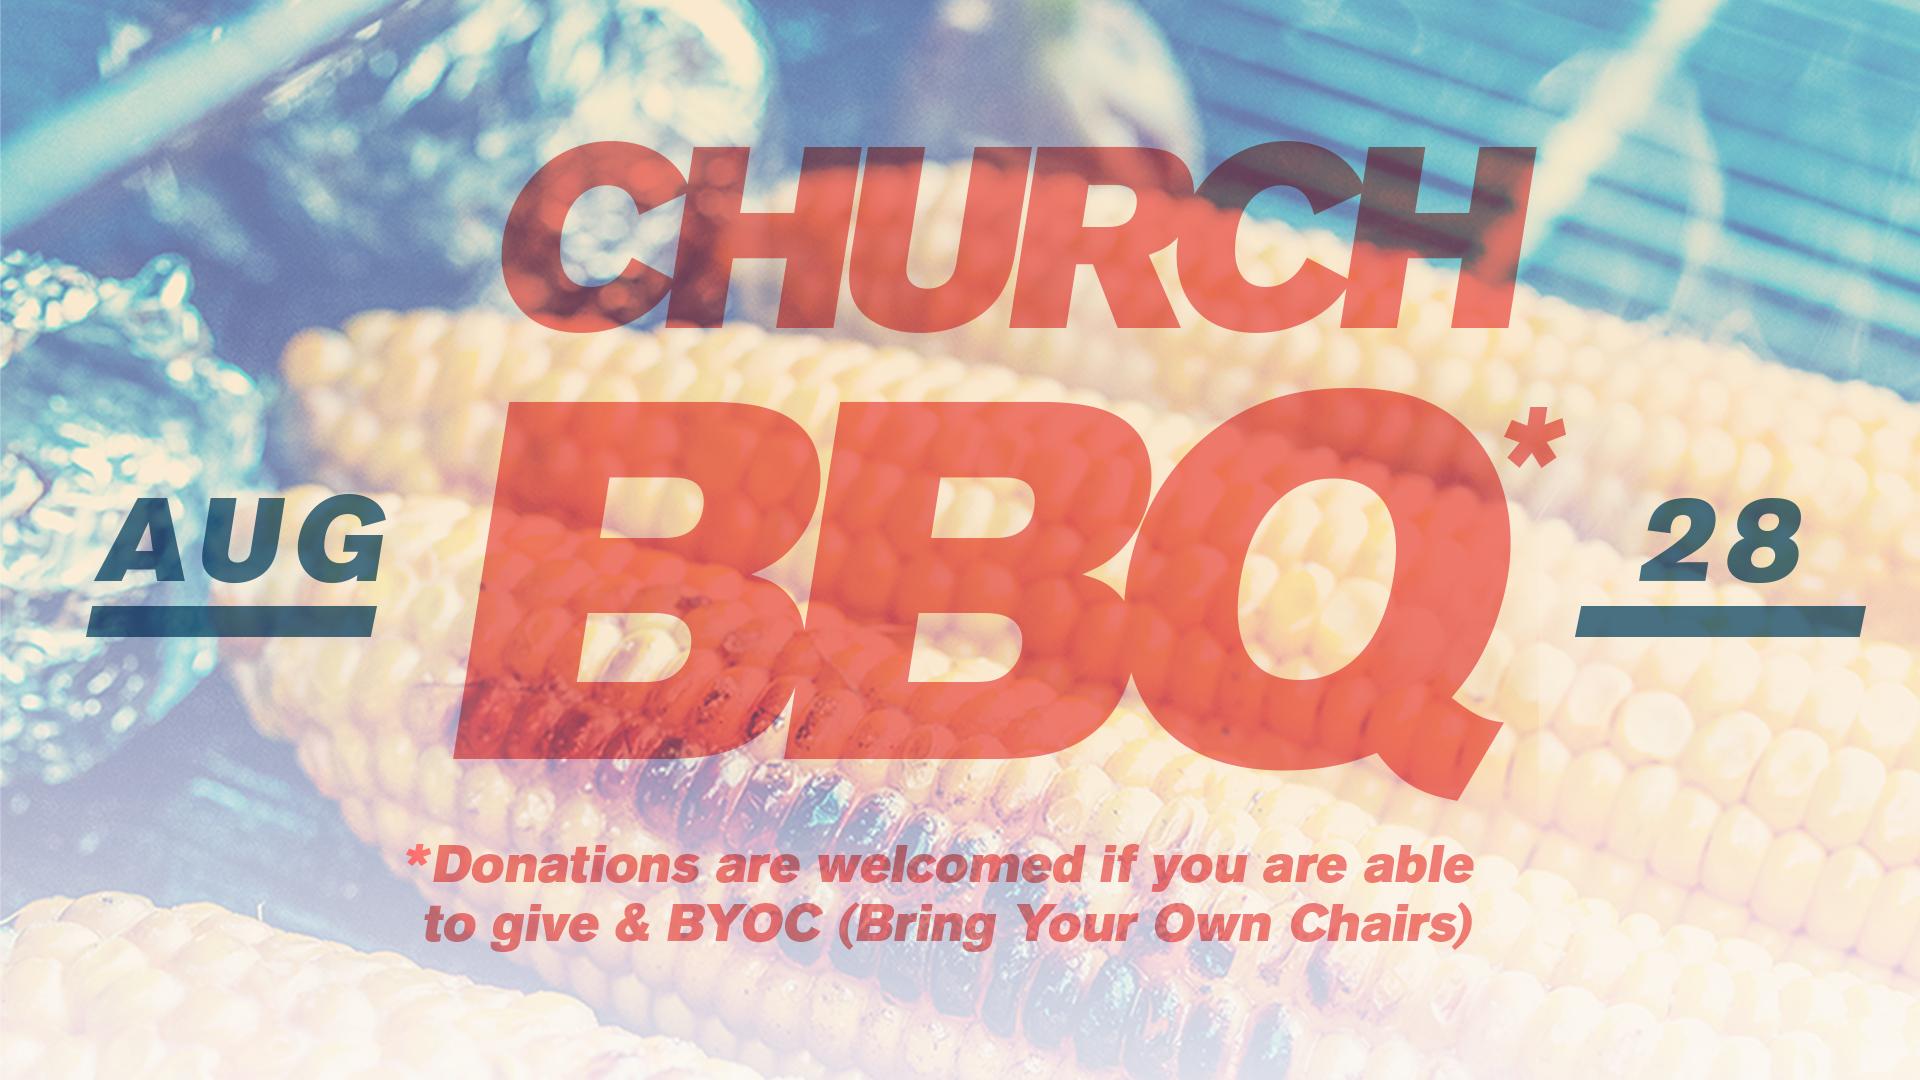 BCC_BBQ_Church-Slide_28AUG.jpg